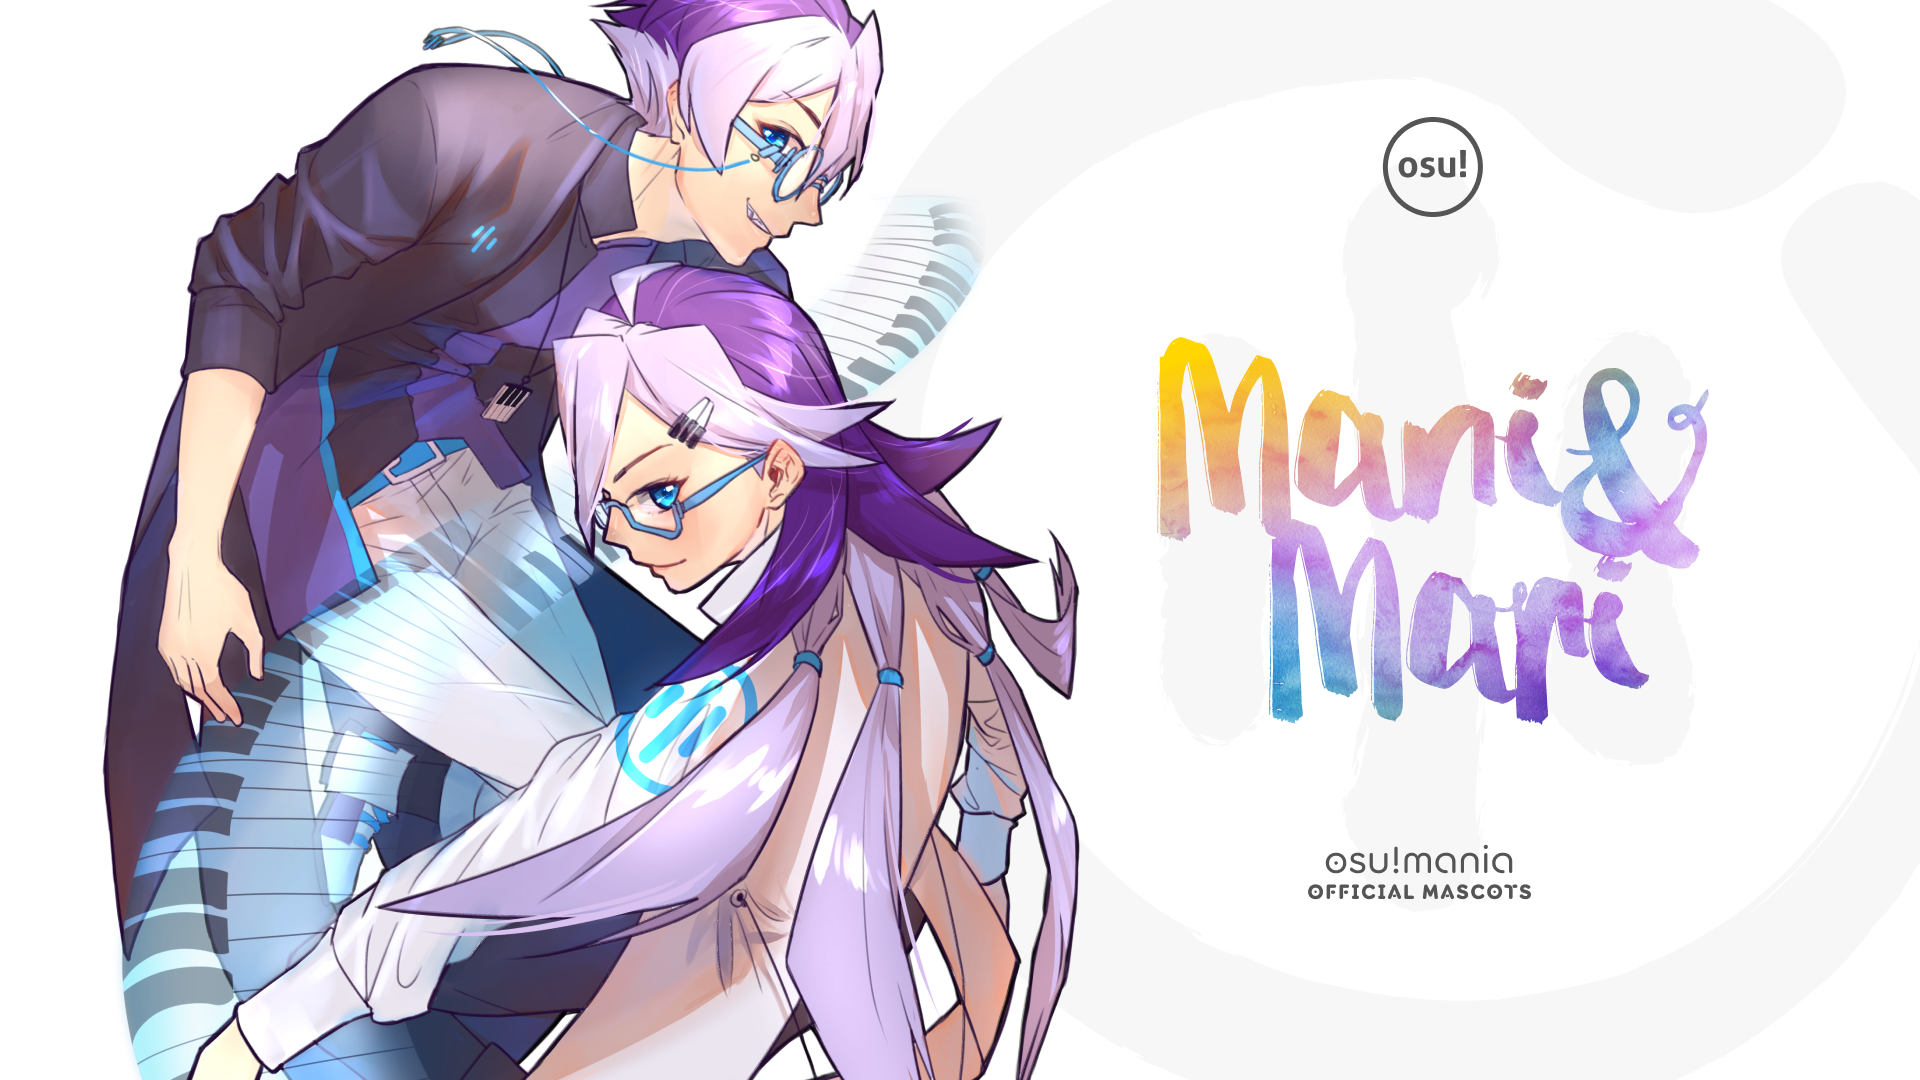 Osu Halloween 2020 Fanart Download Introducing Mani and Mari, the New osu!mania Mascots · news | osu!